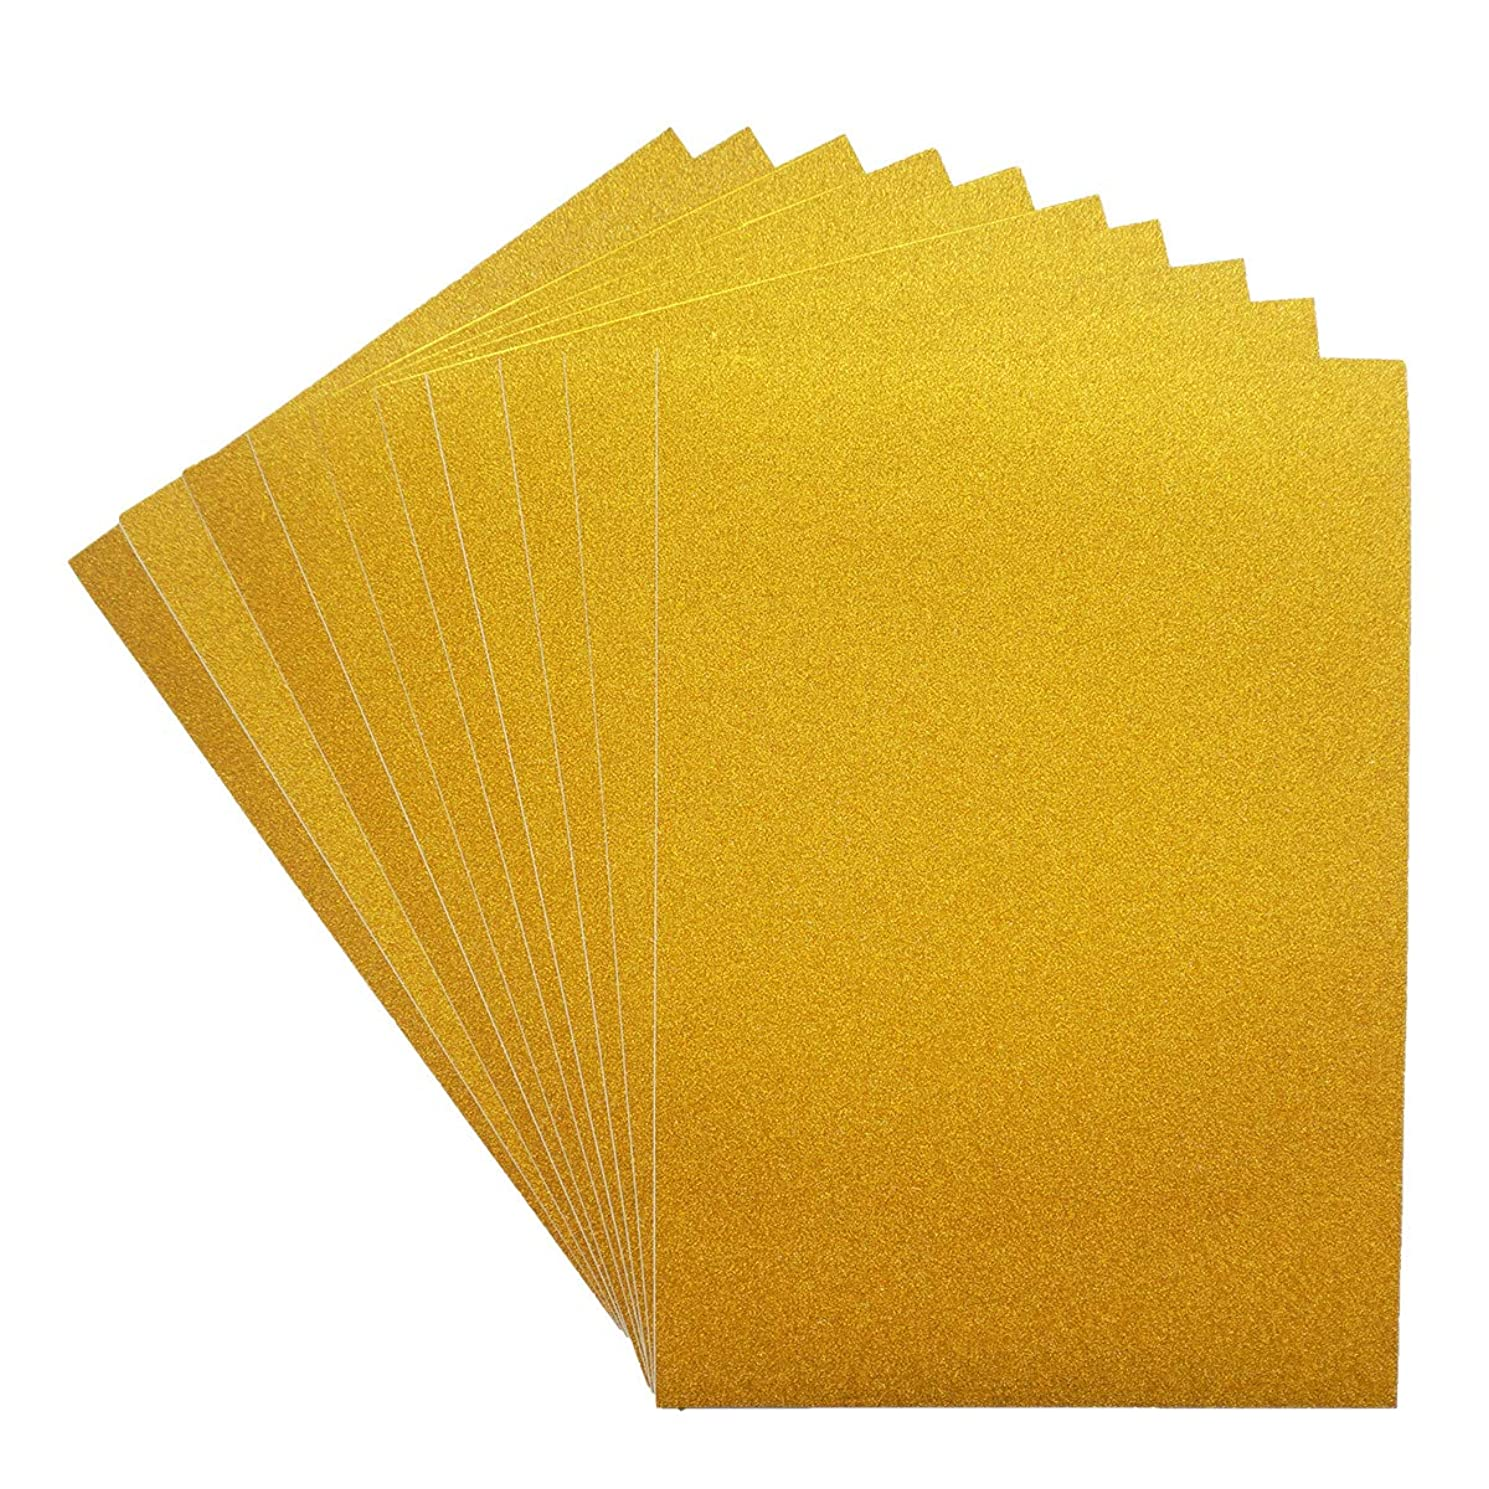 Misscrafts Adhesive Sheets 10 Sheets Adhesive Glitter Paper 12